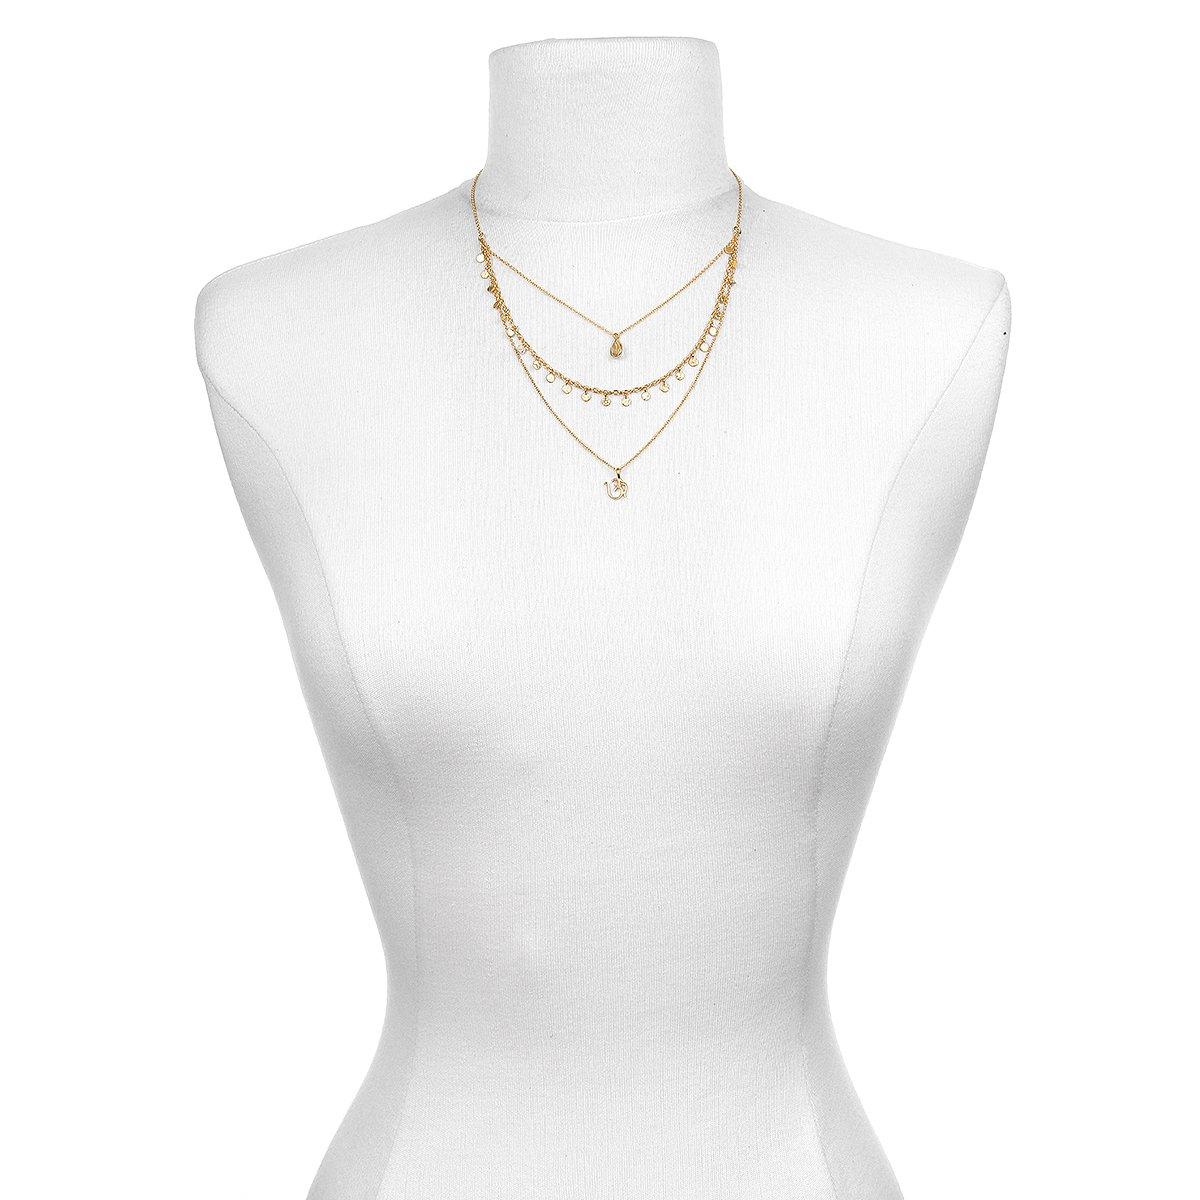 Satya Jewelry Citrine Gold Plate Om Triple Chain Necklace, 20'' by Satya Jewelry (Image #3)